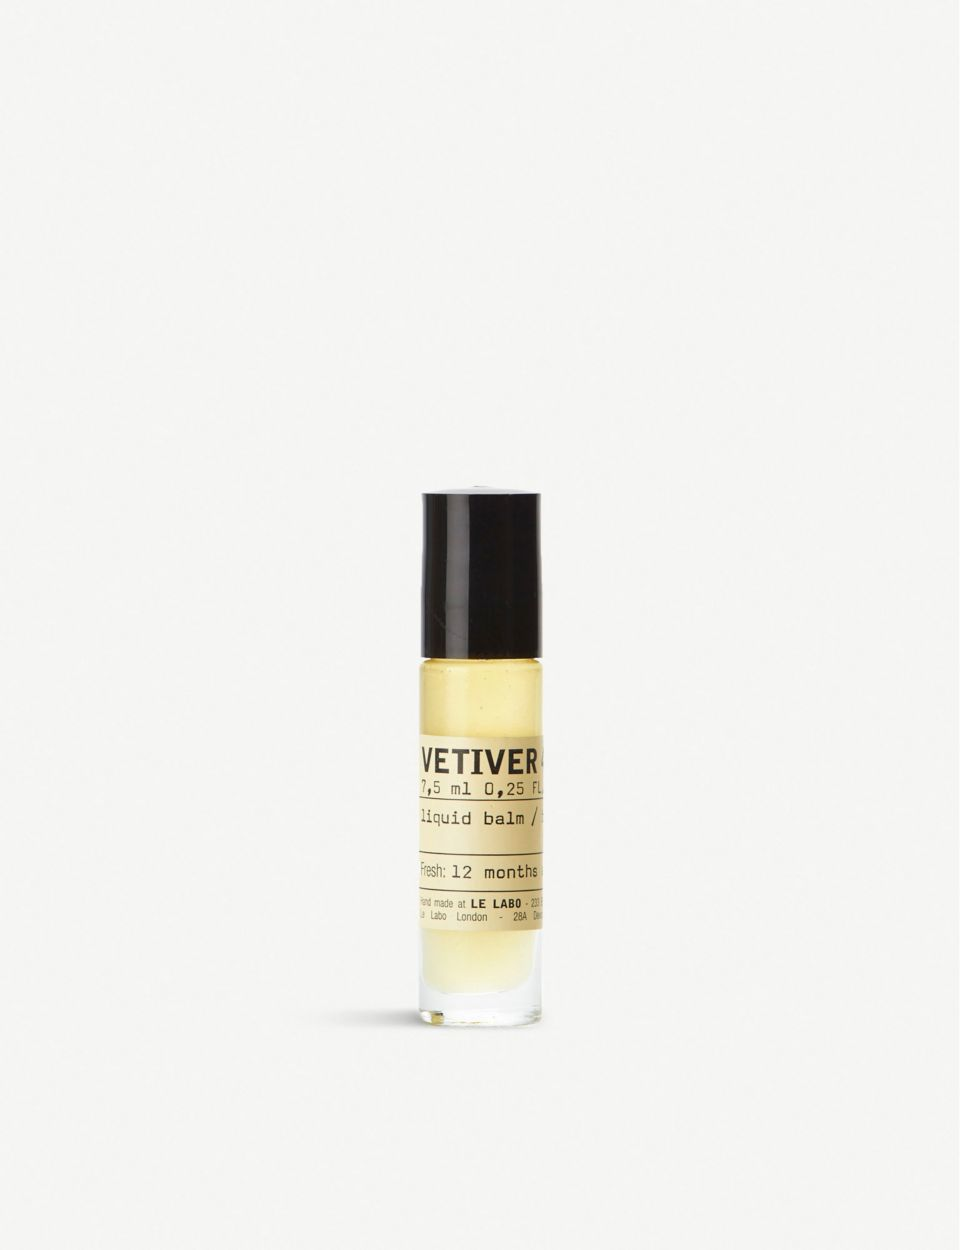 Vetiver 46 travel liquid balm perfume 7.5ml